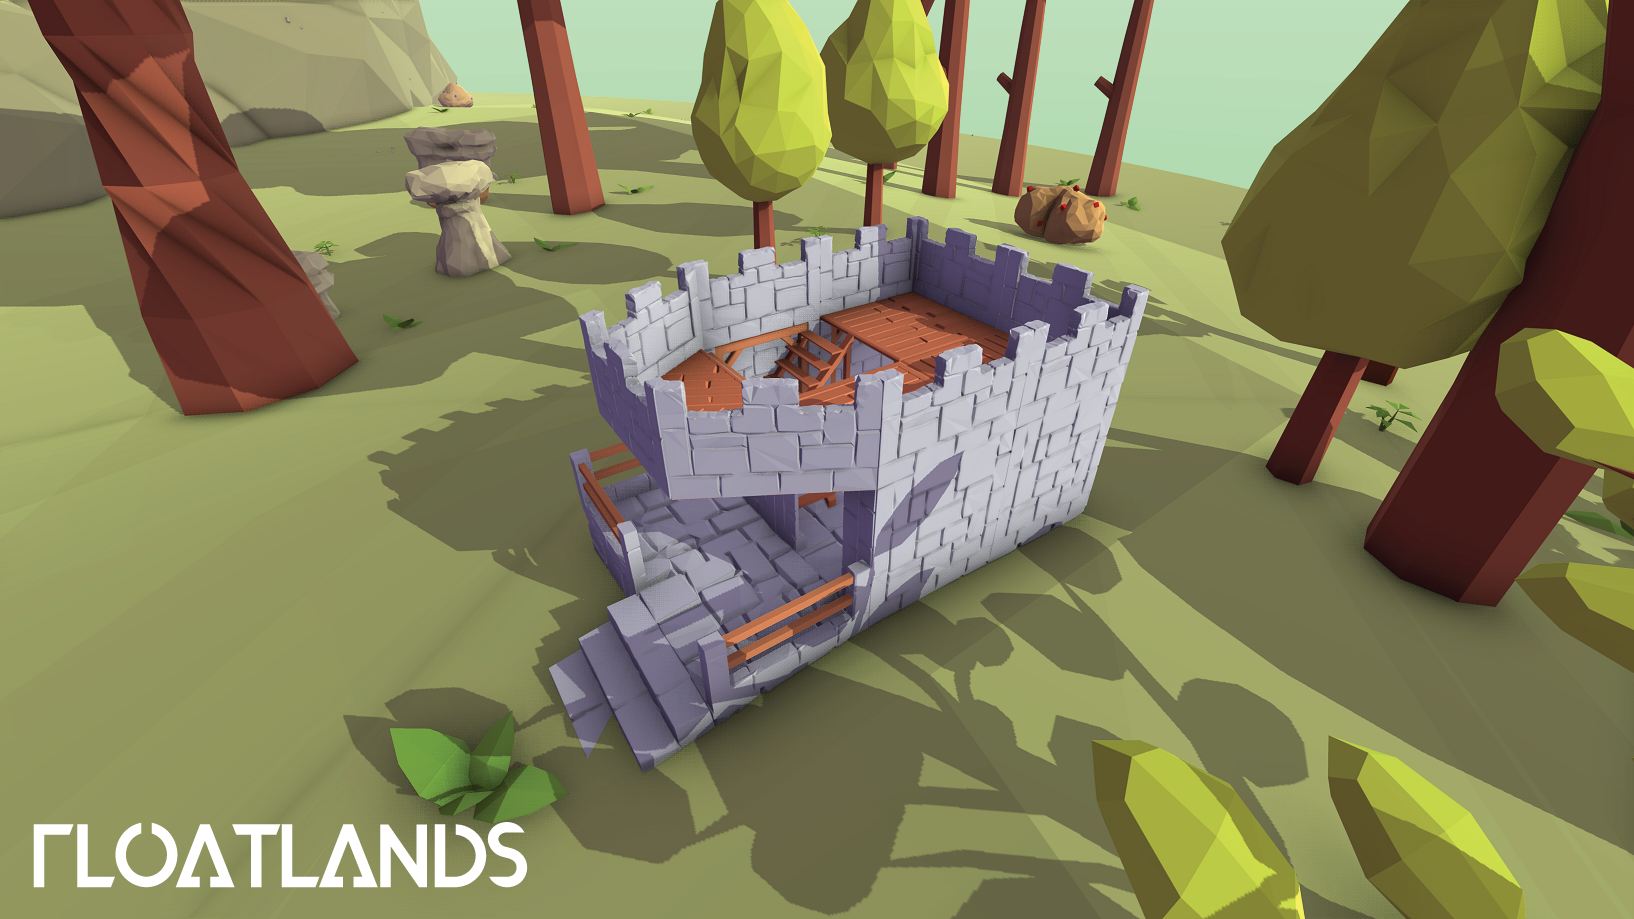 stone-base-lowpoly-floatlands2.png